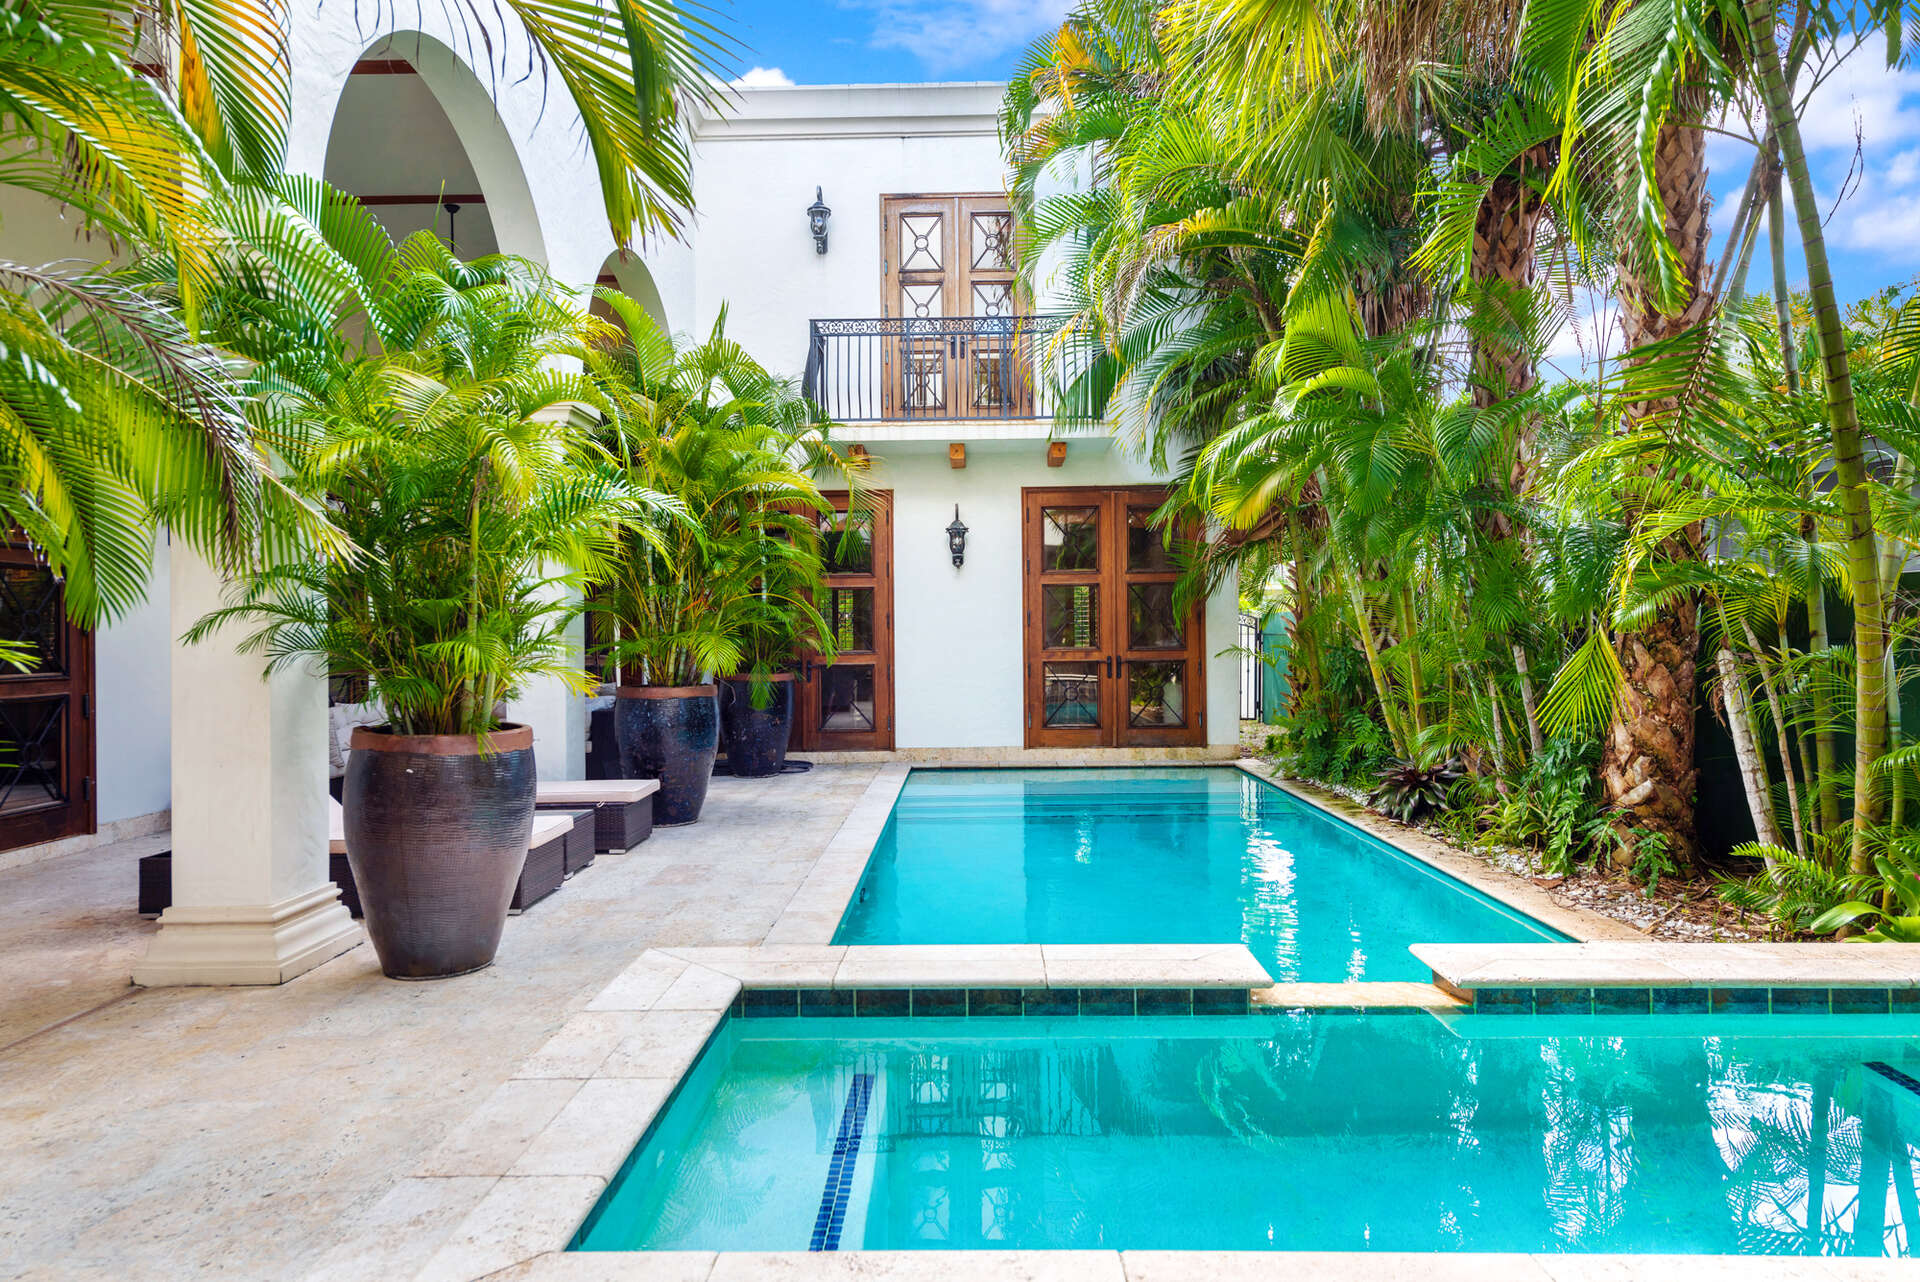 Luxury vacation rentals usa - Florida - Fort lauderdale - Villa Philippe - Image 1/41